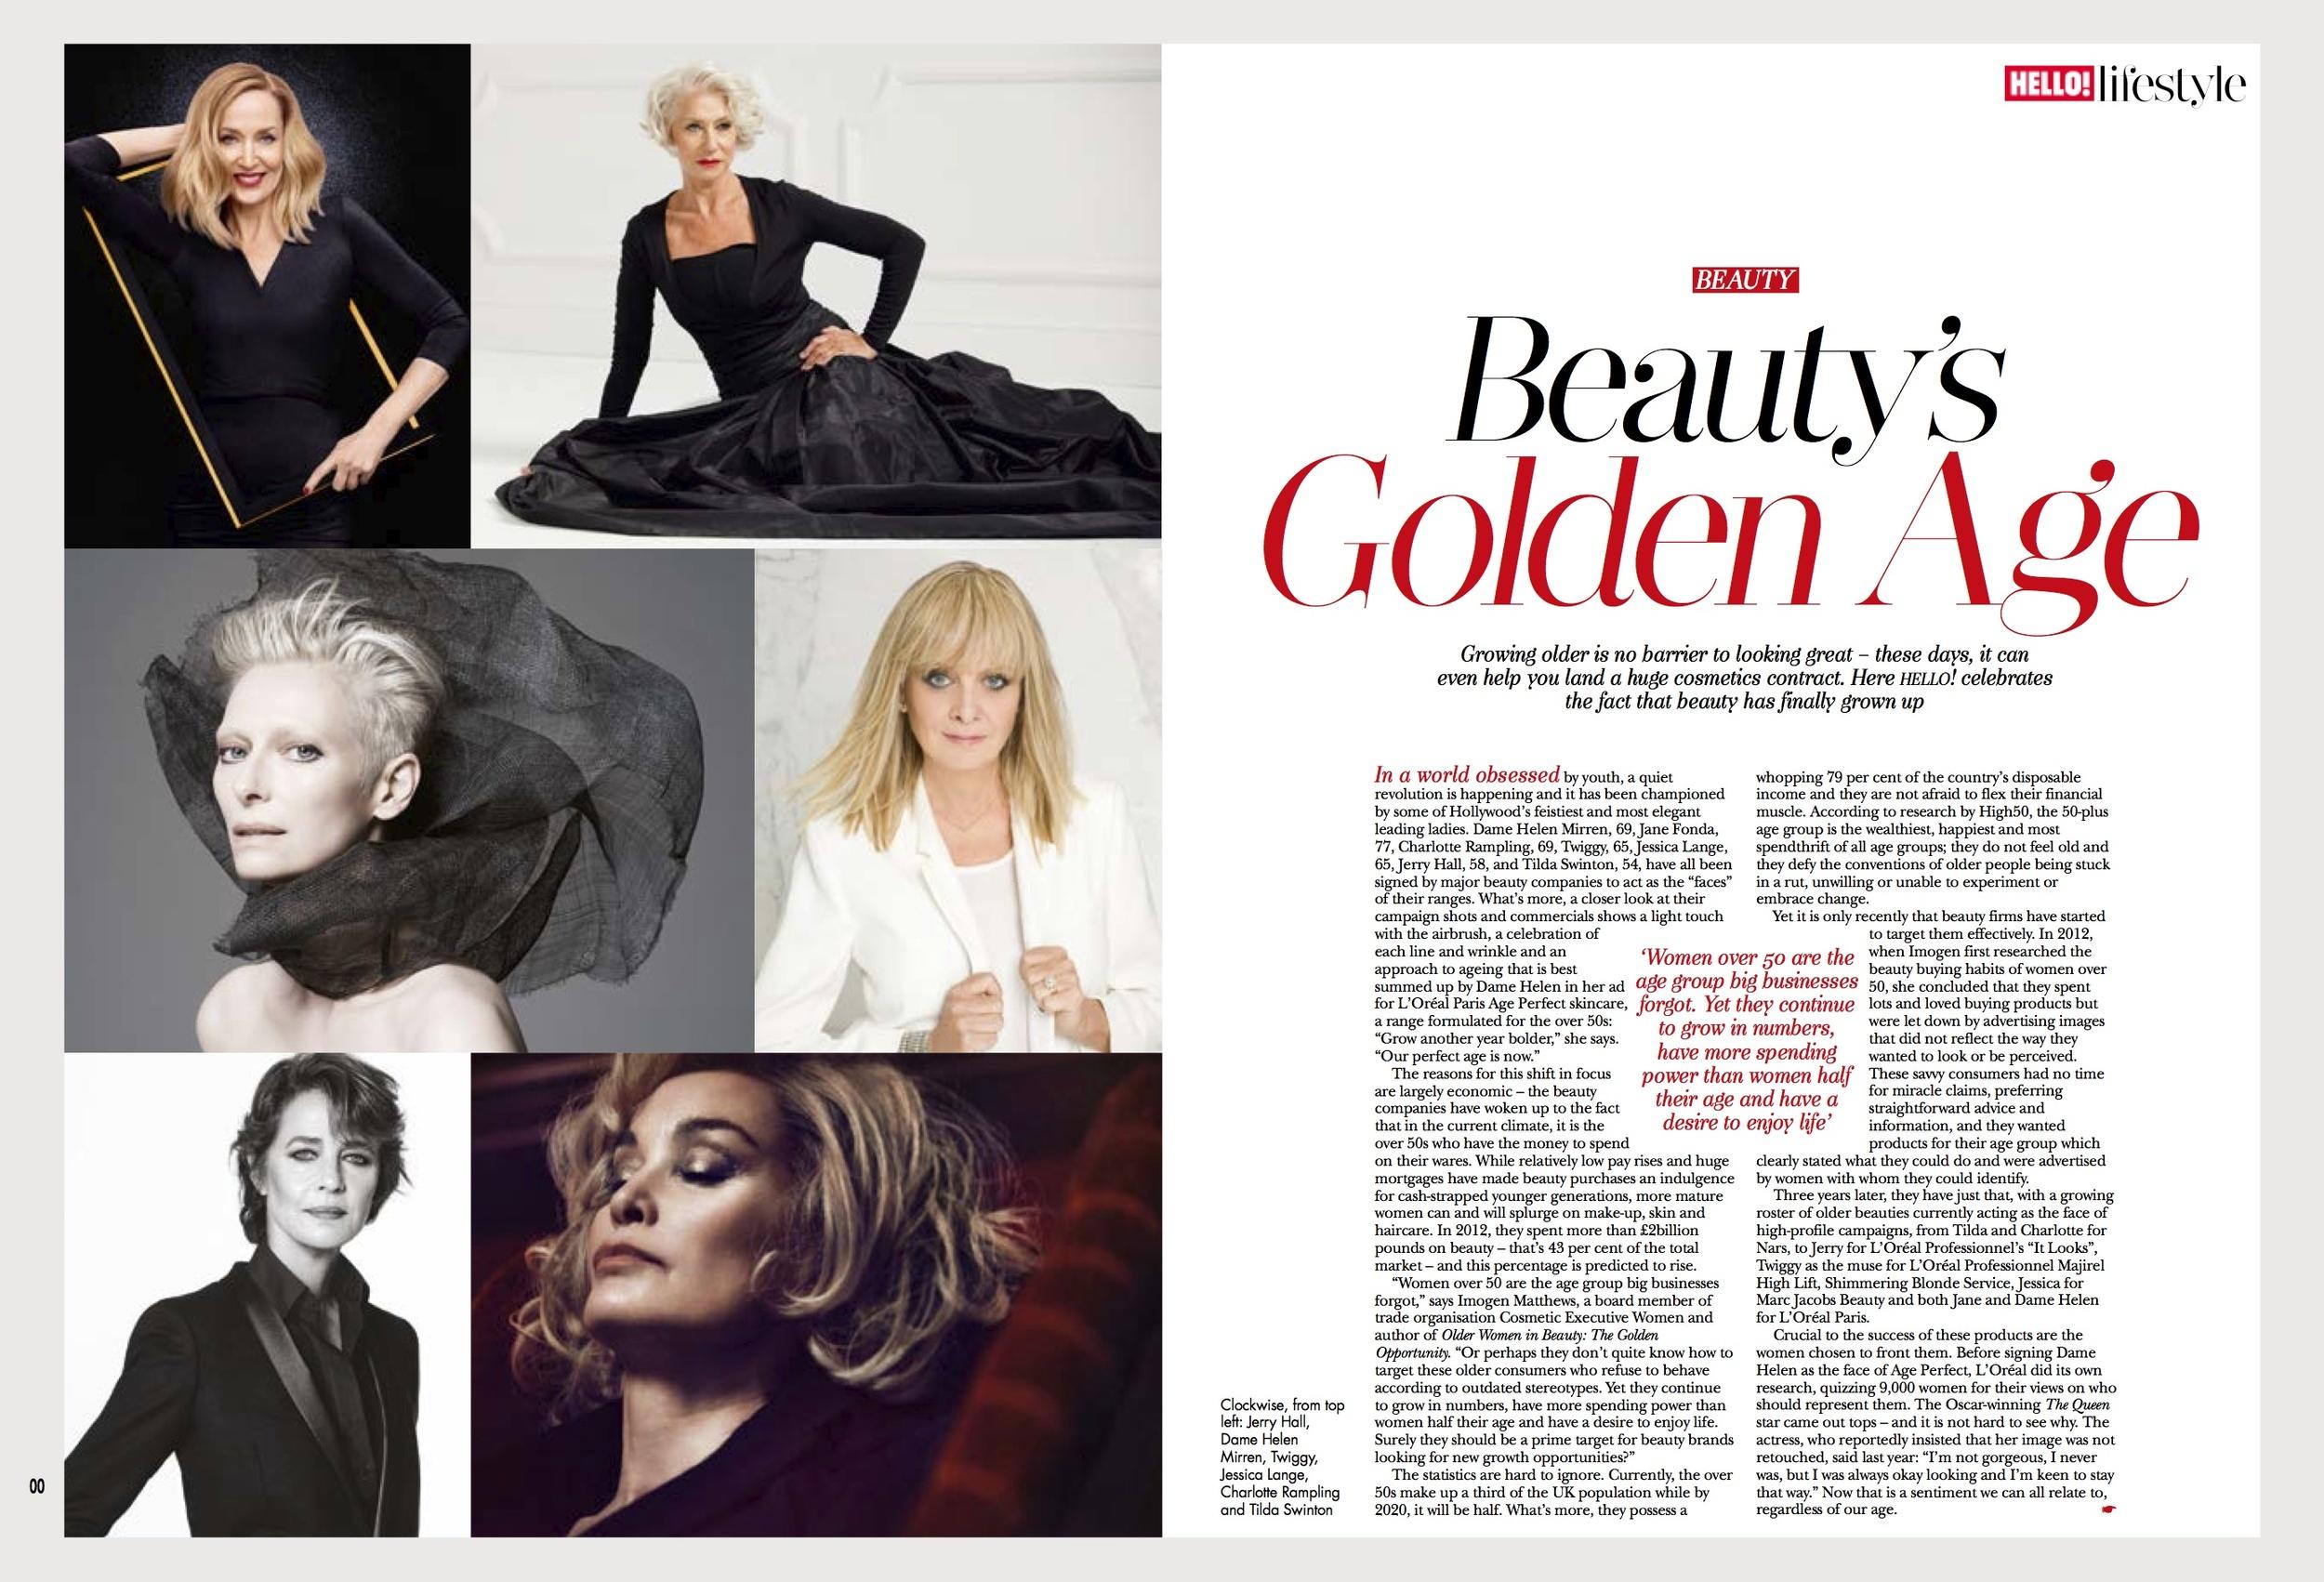 Beauty's golden age (1).jpg